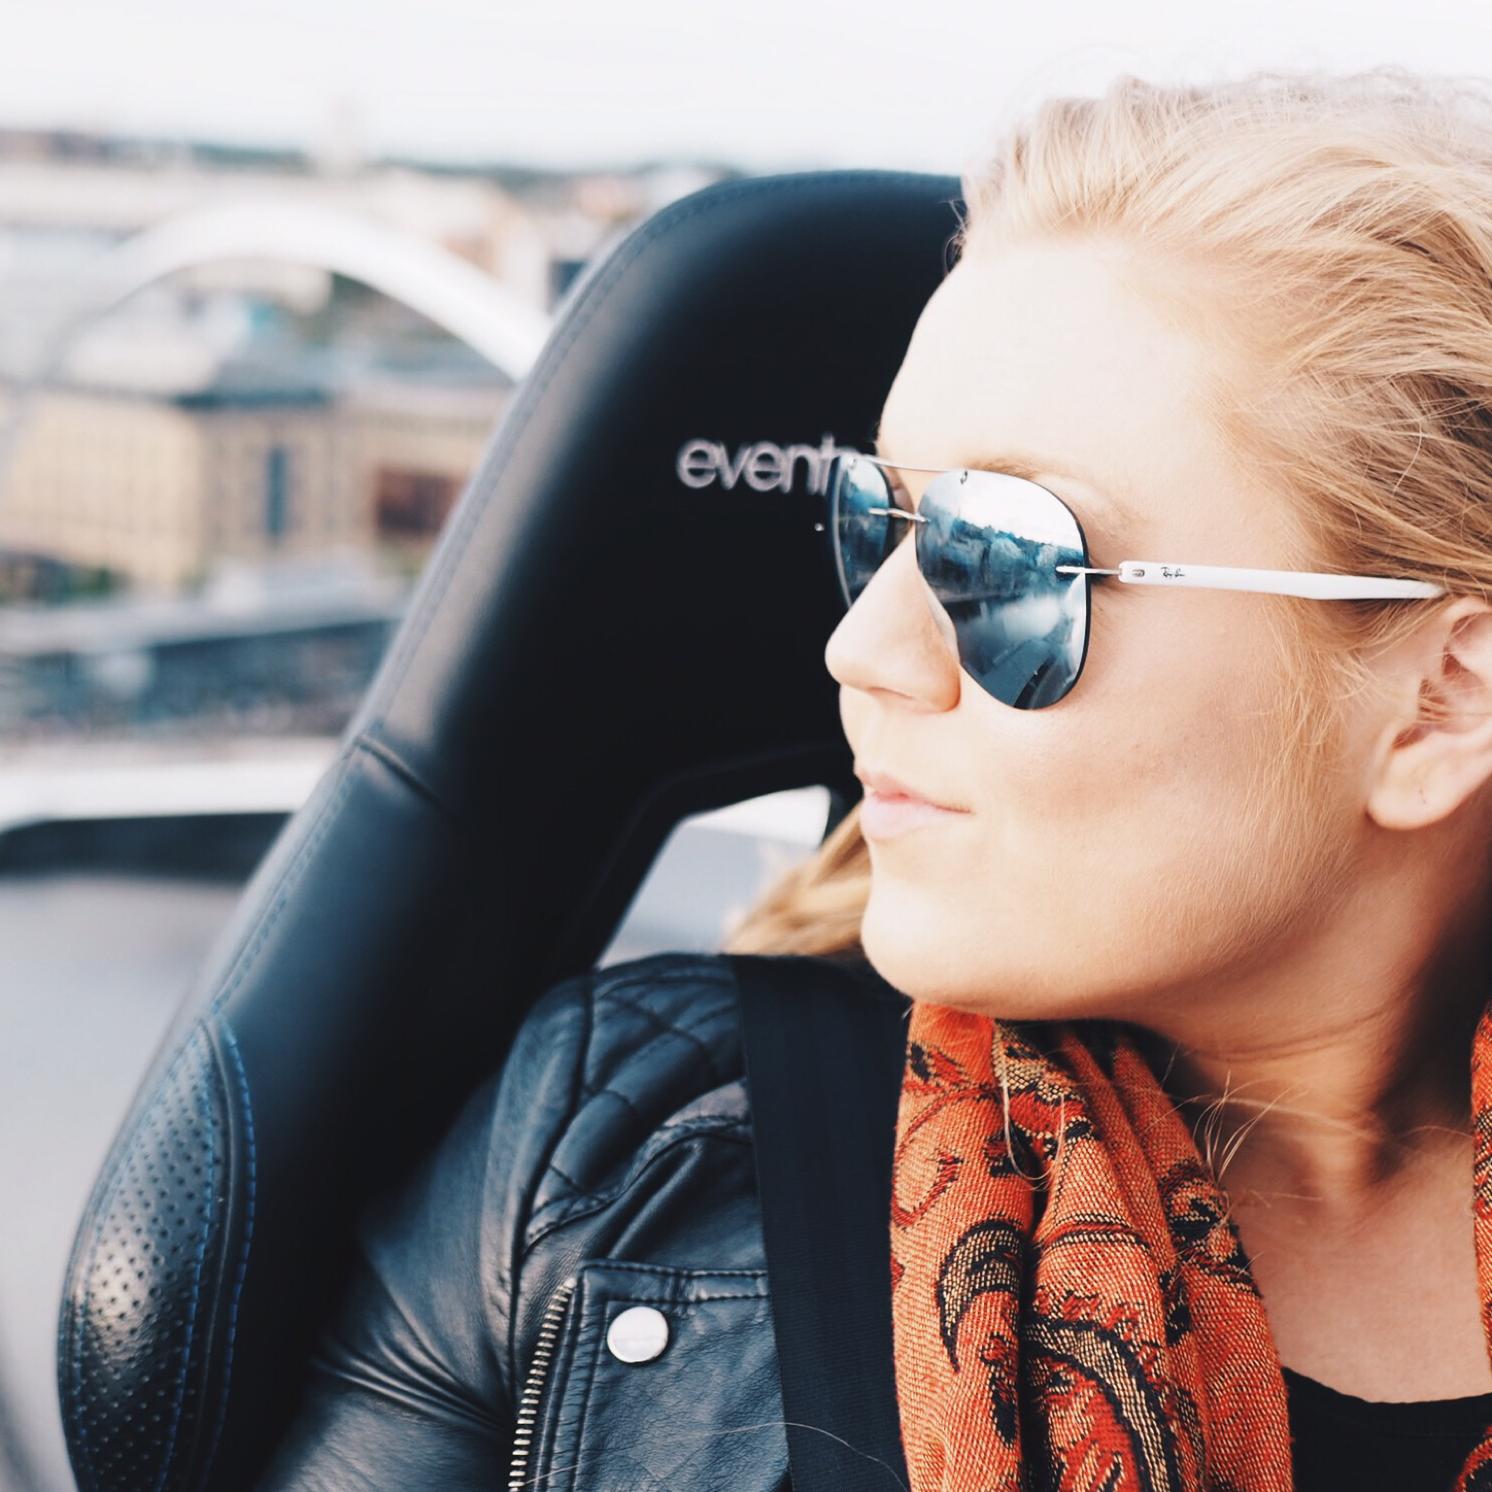 events-in-the-sky-sunglasses-shop-rayban-aviators-elle-blonde-luxury-lifestyle-destination-blog